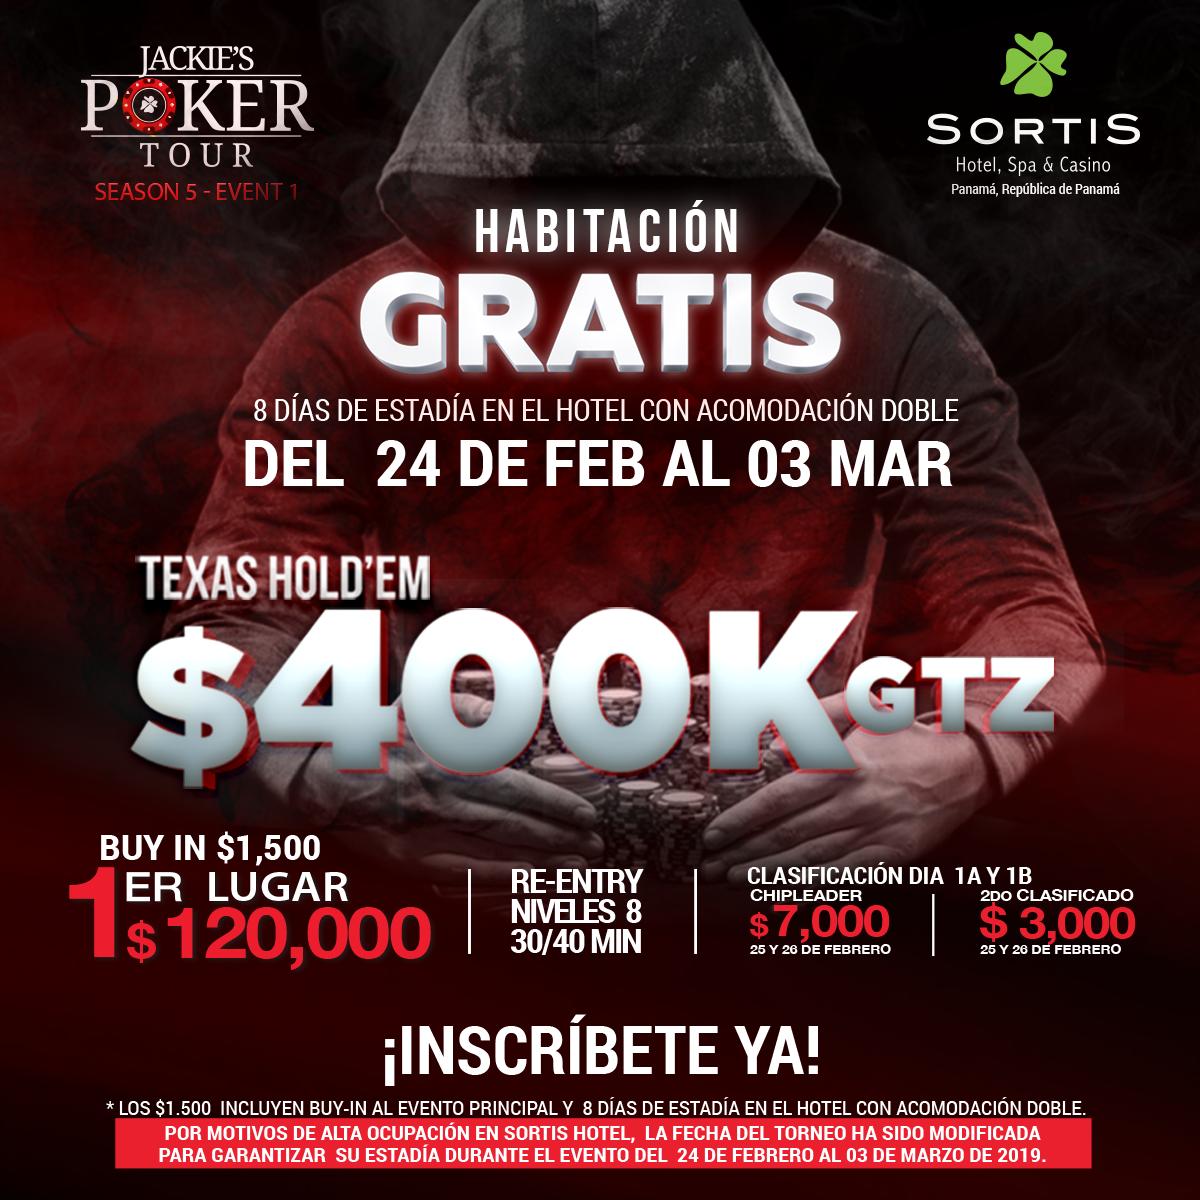 Torneo de PókerSeason 5 - Event 1con $400k GTZ